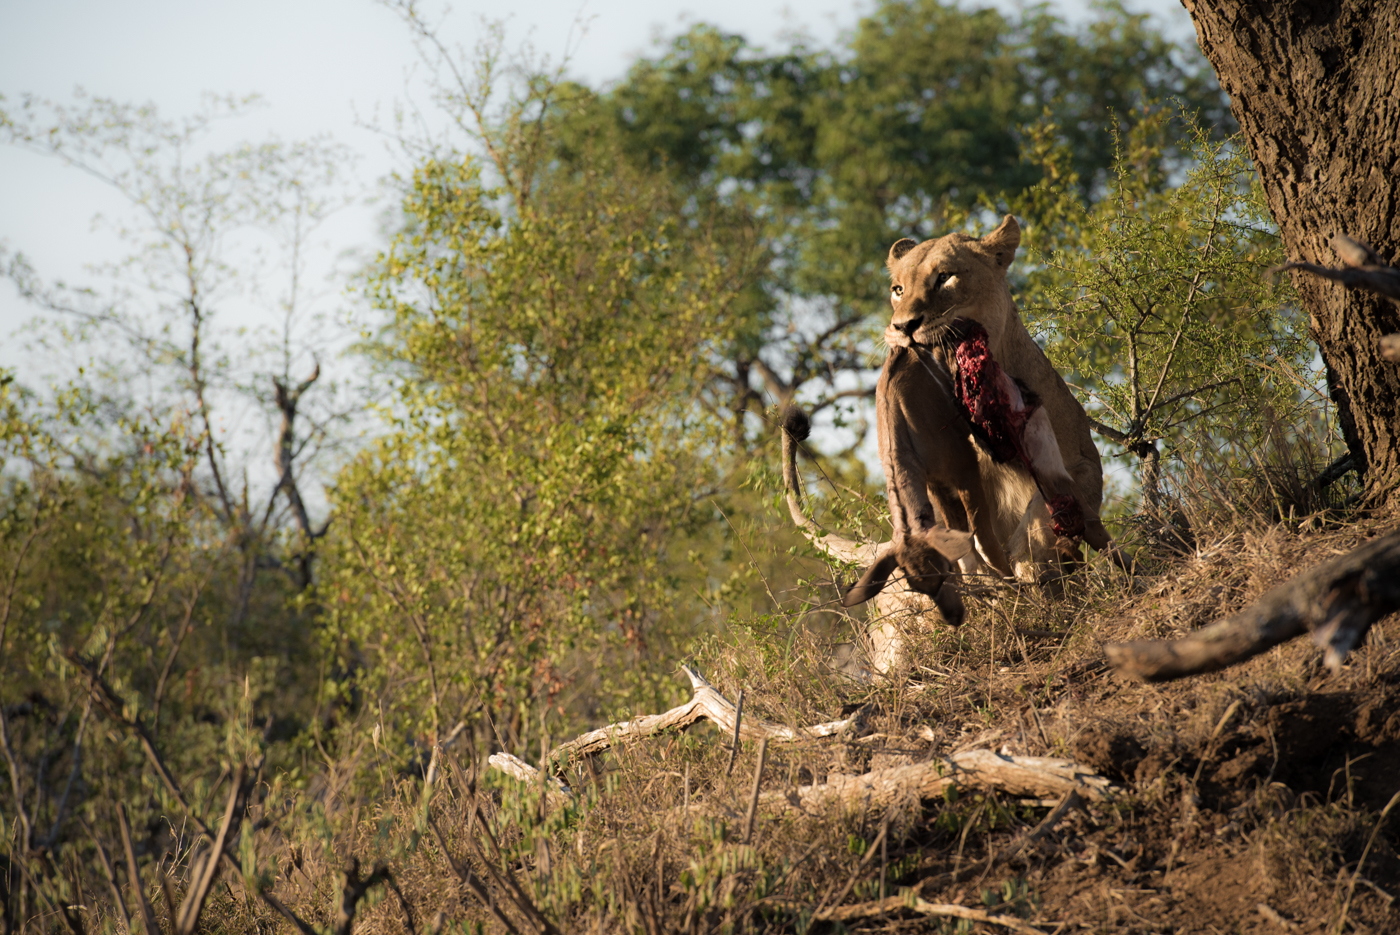 mhangeni lioness, feb 2016, SC